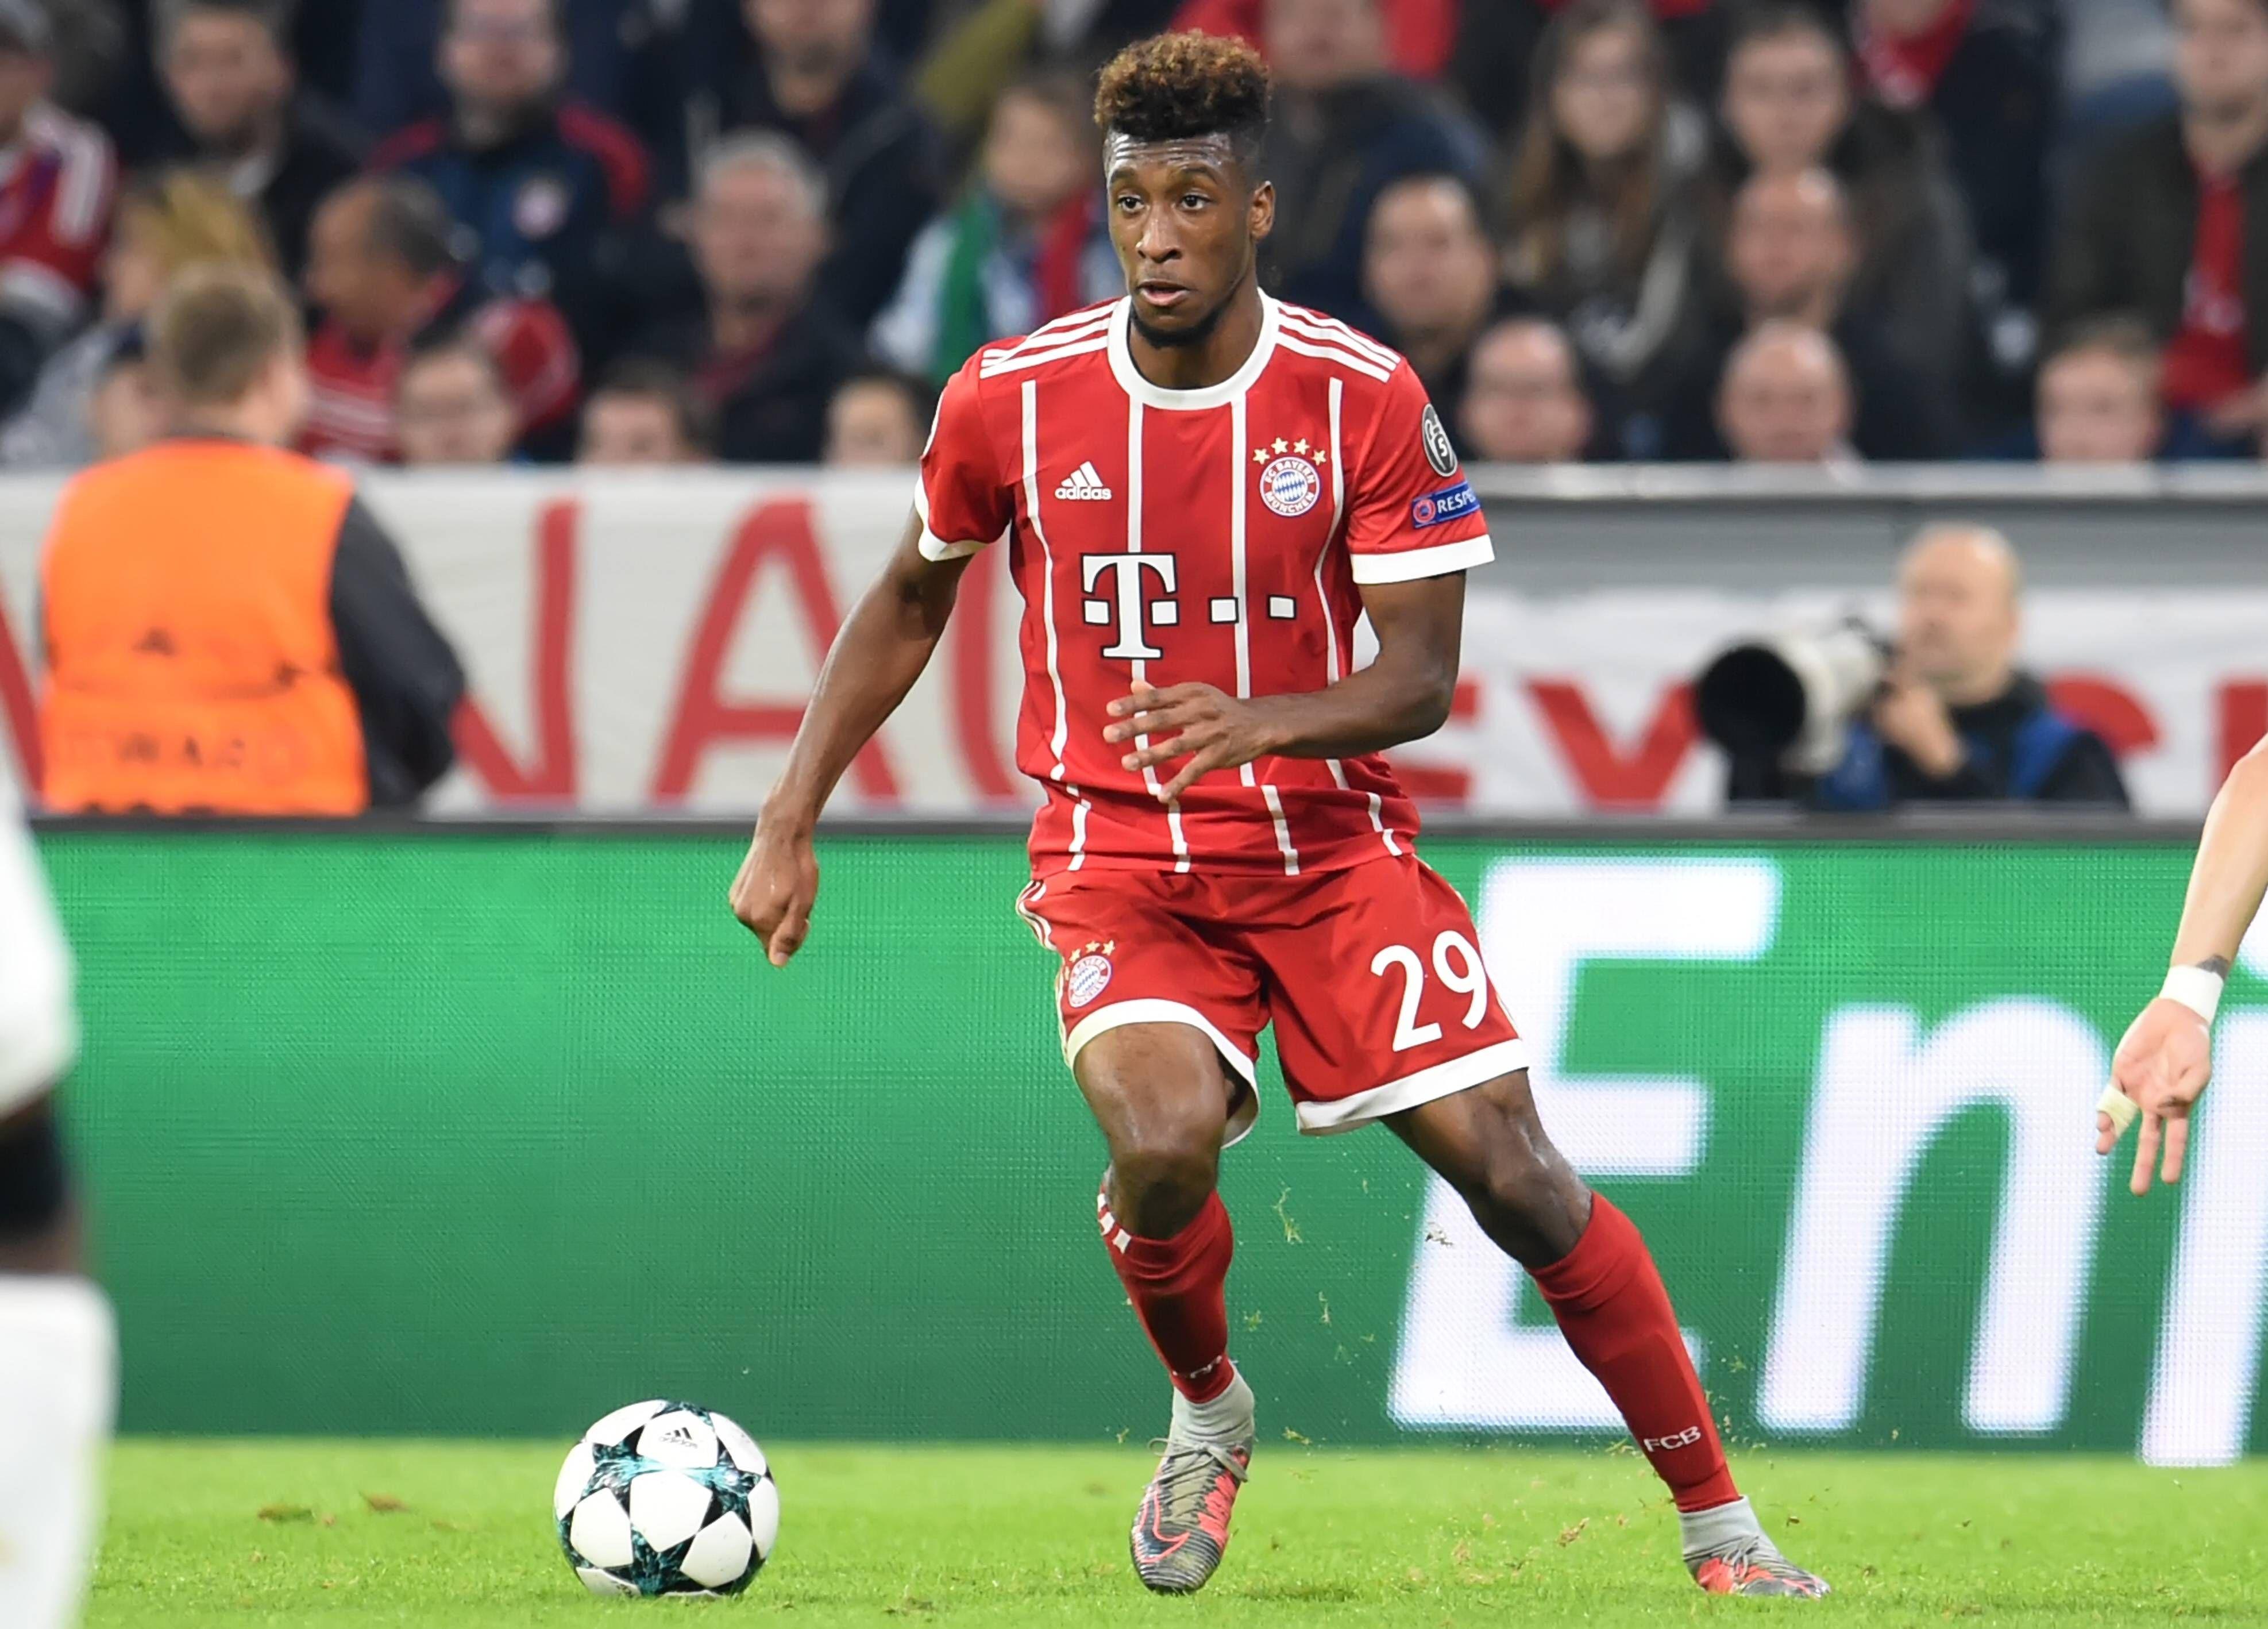 Football - Etranger - Bundesliga : la 16e journée en direct